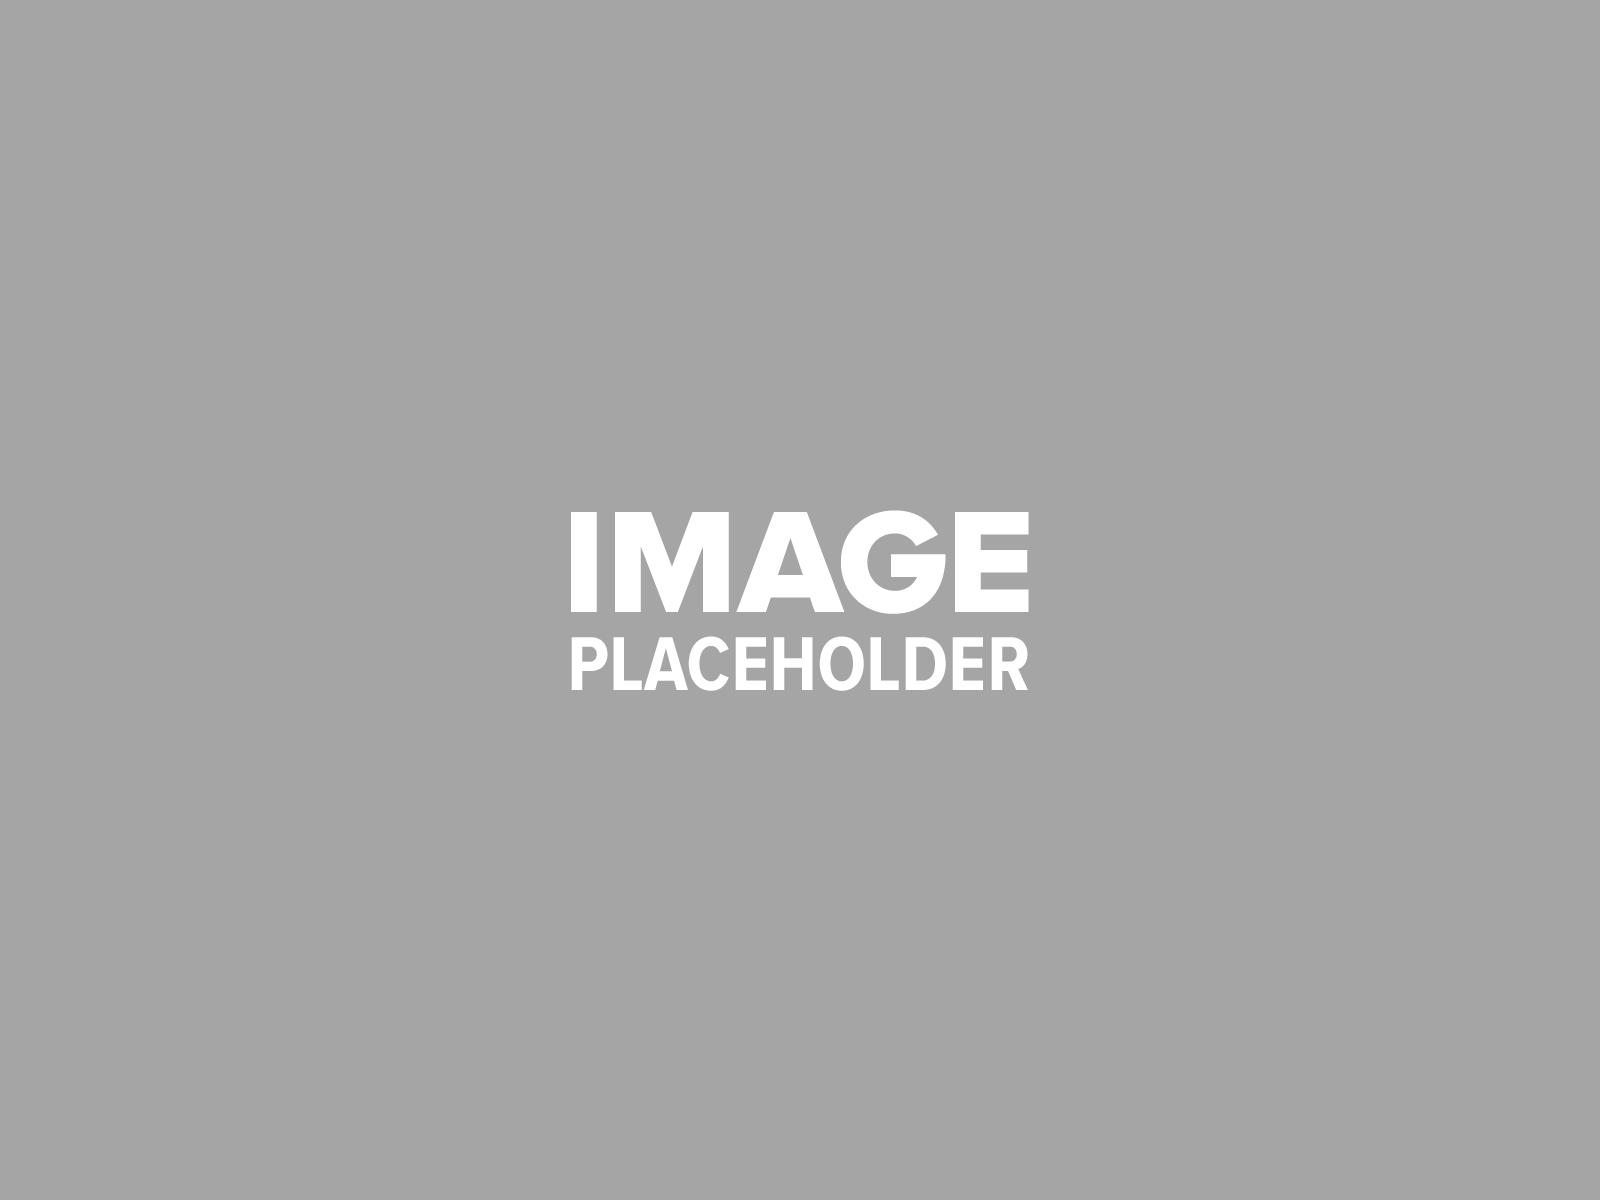 pojo-placeholder-3